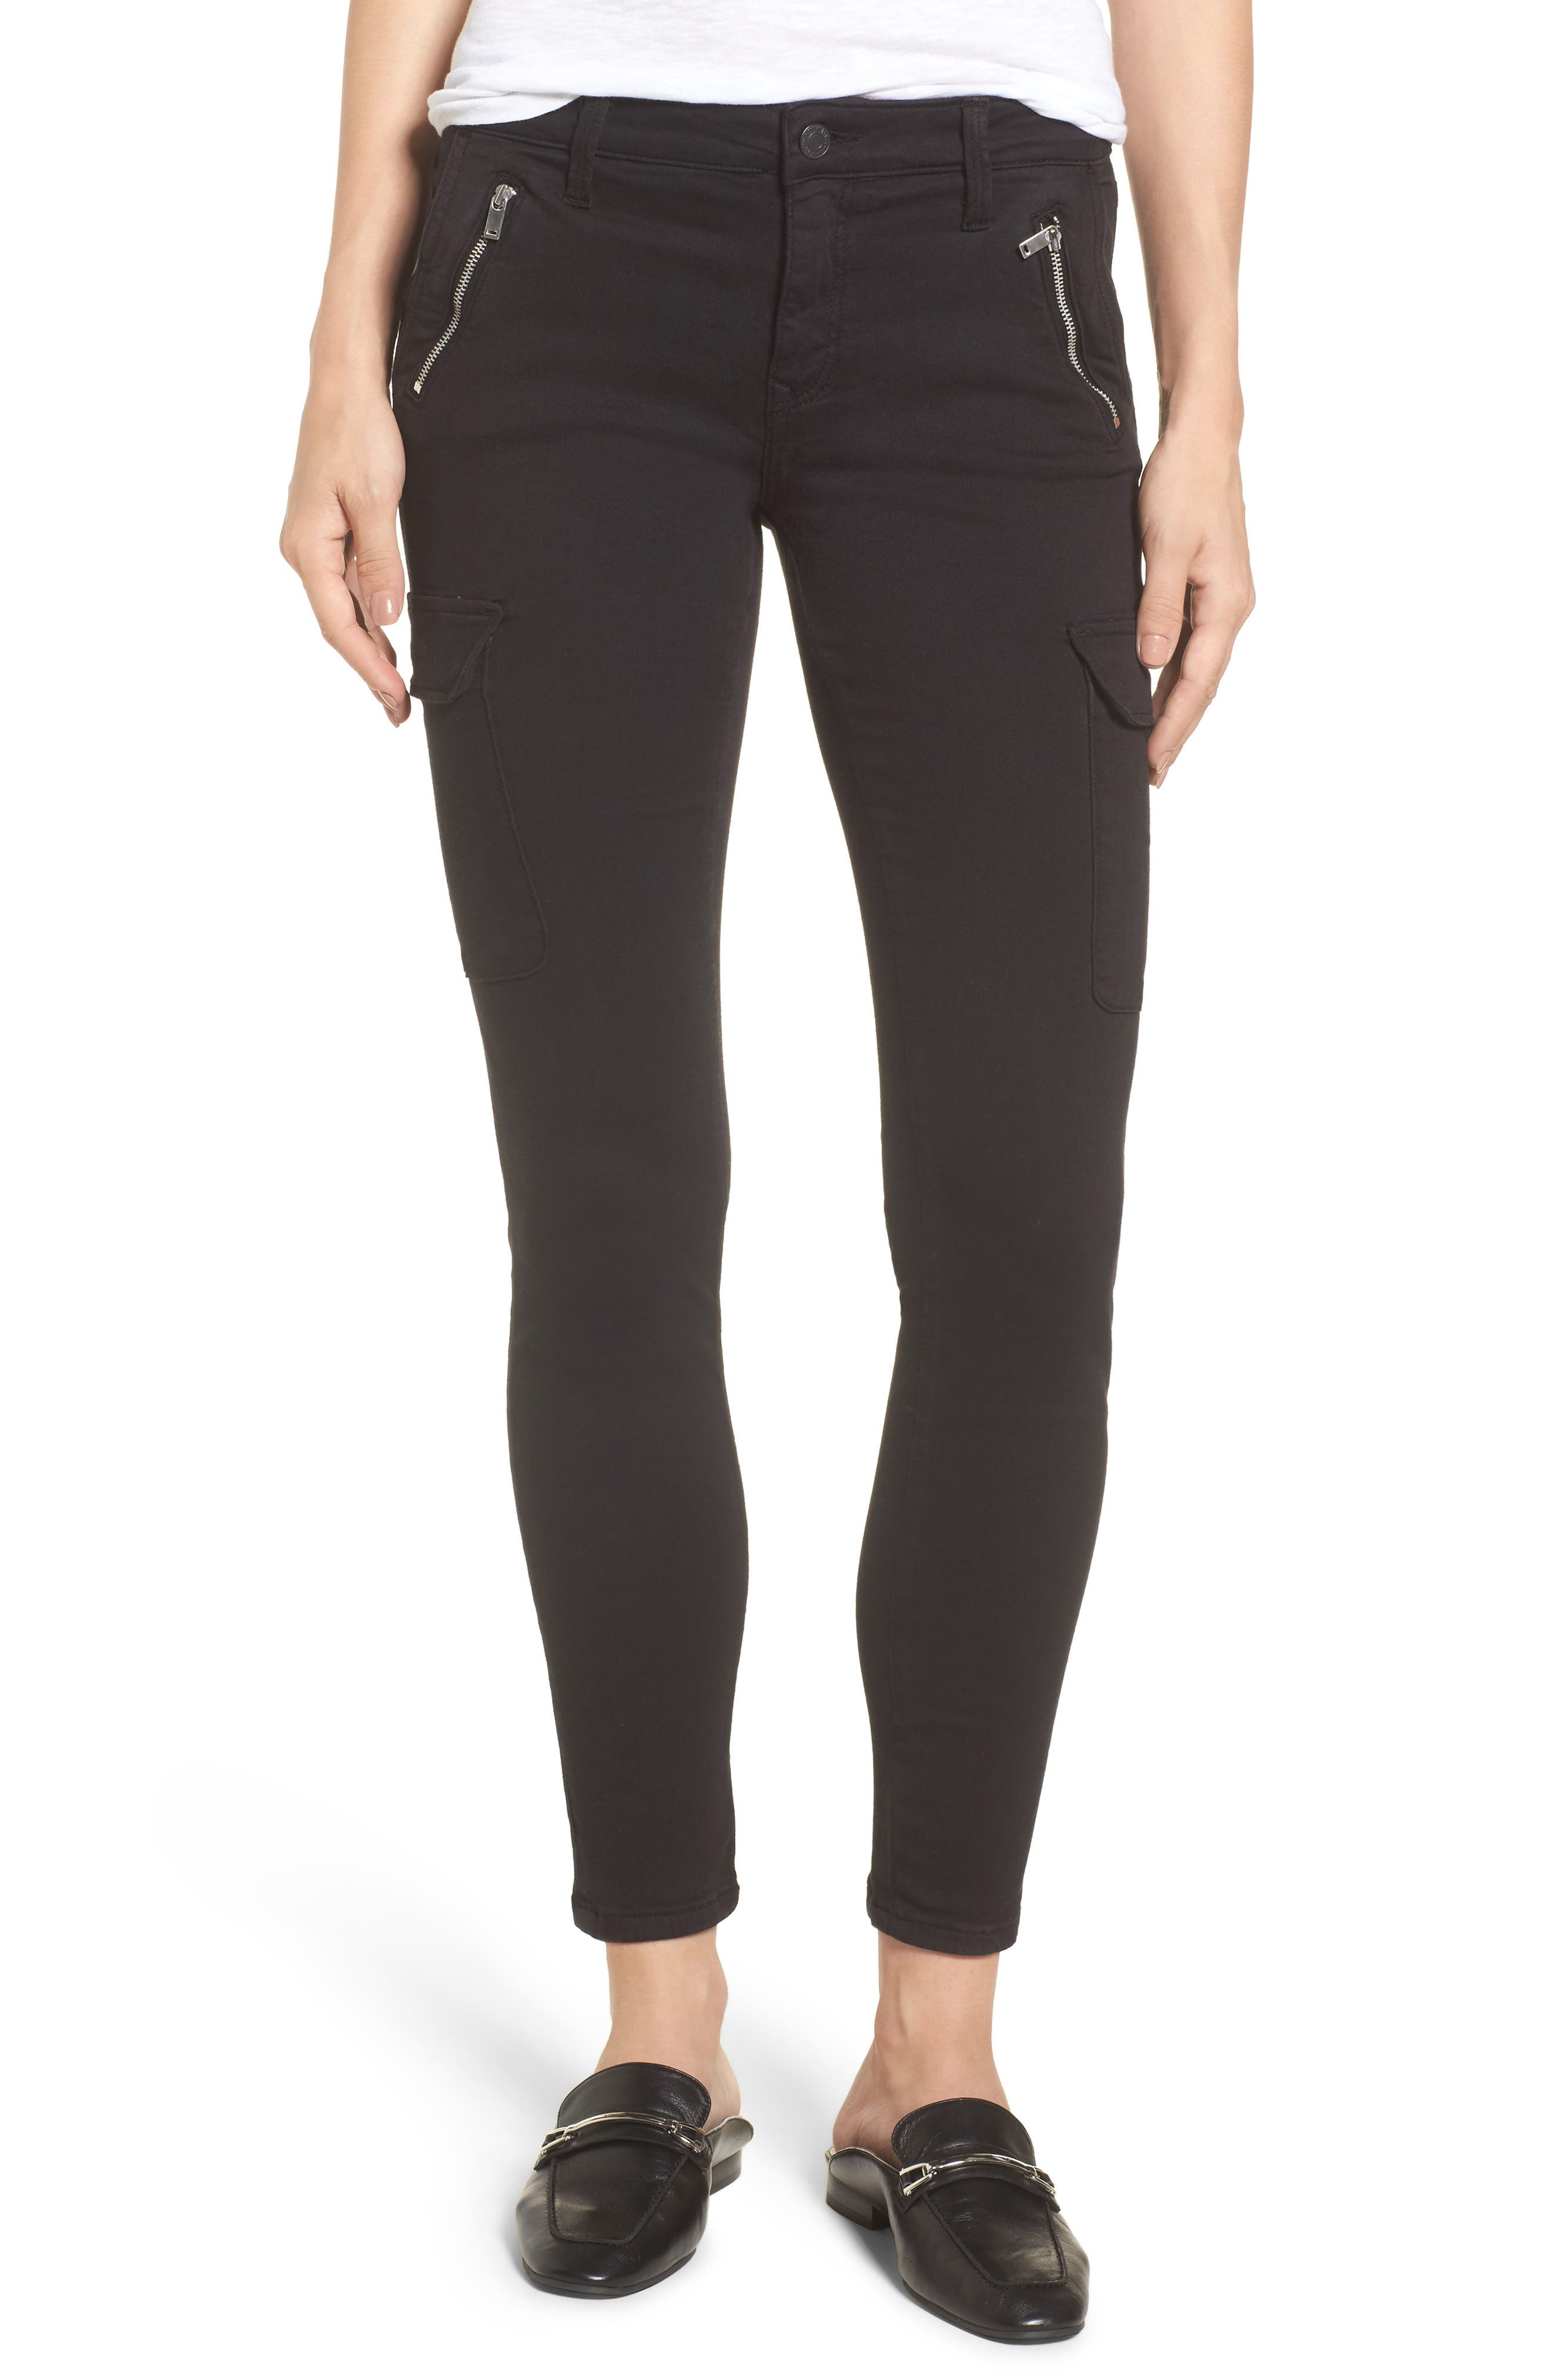 Juliette Skinny Cargo Pants,                         Main,                         color, 001